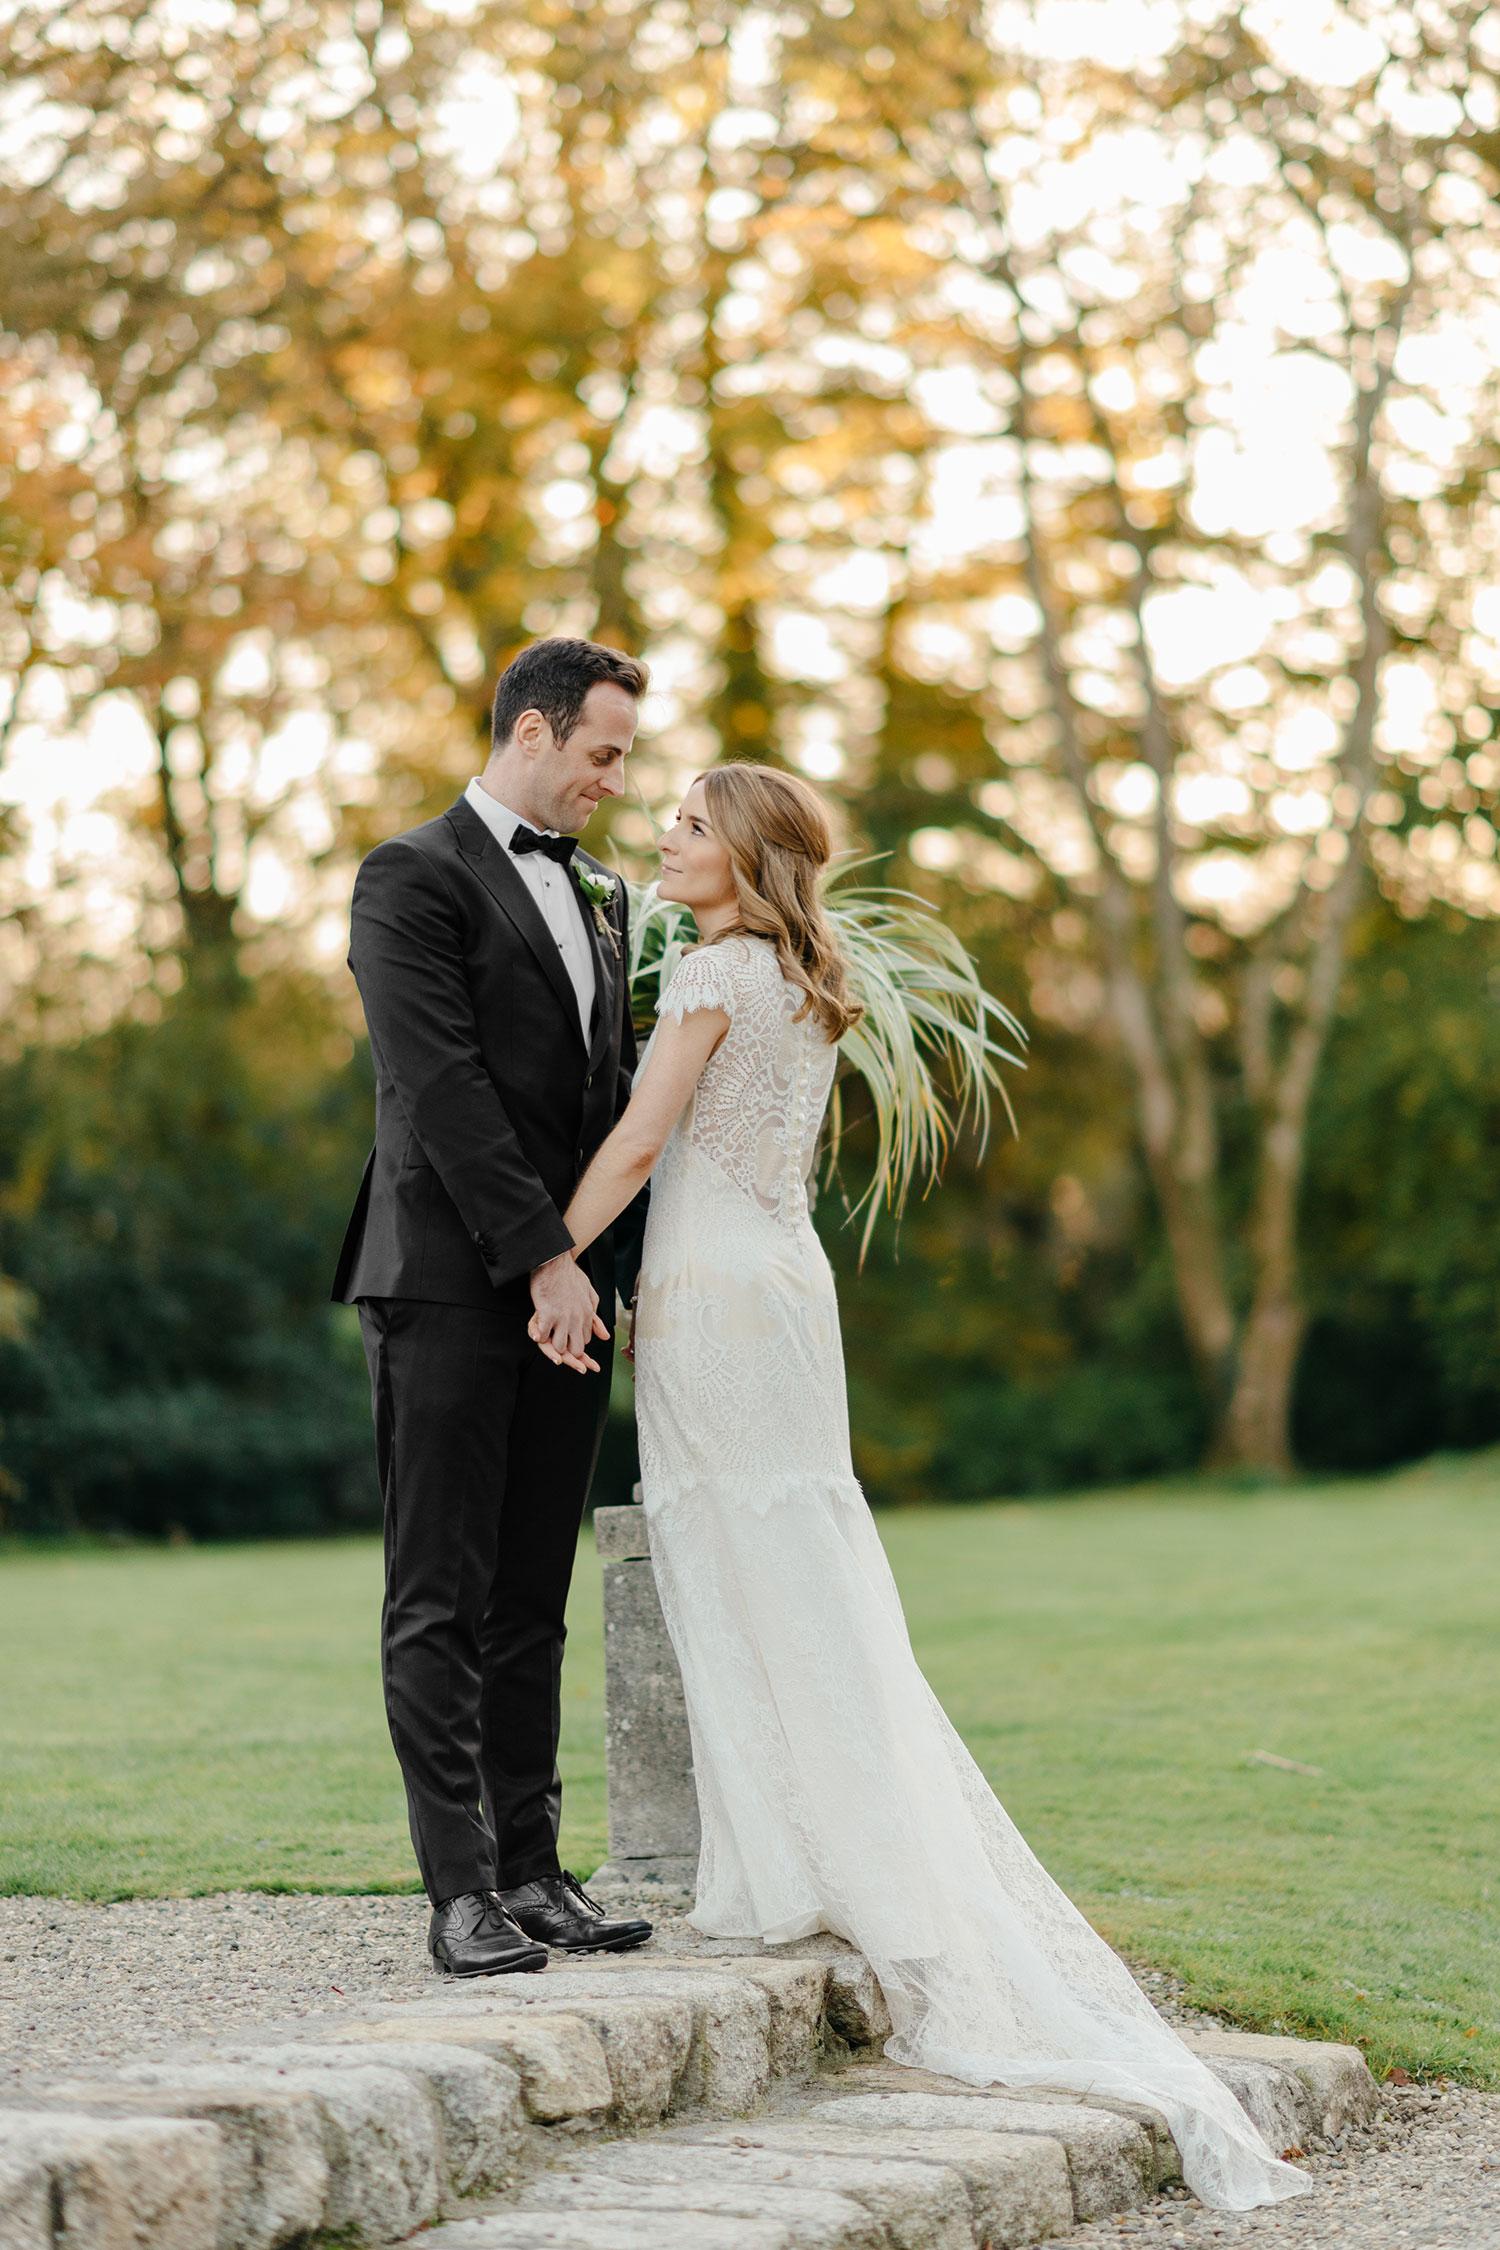 bellinter-house-wedding-photographer-0109_0109.jpg